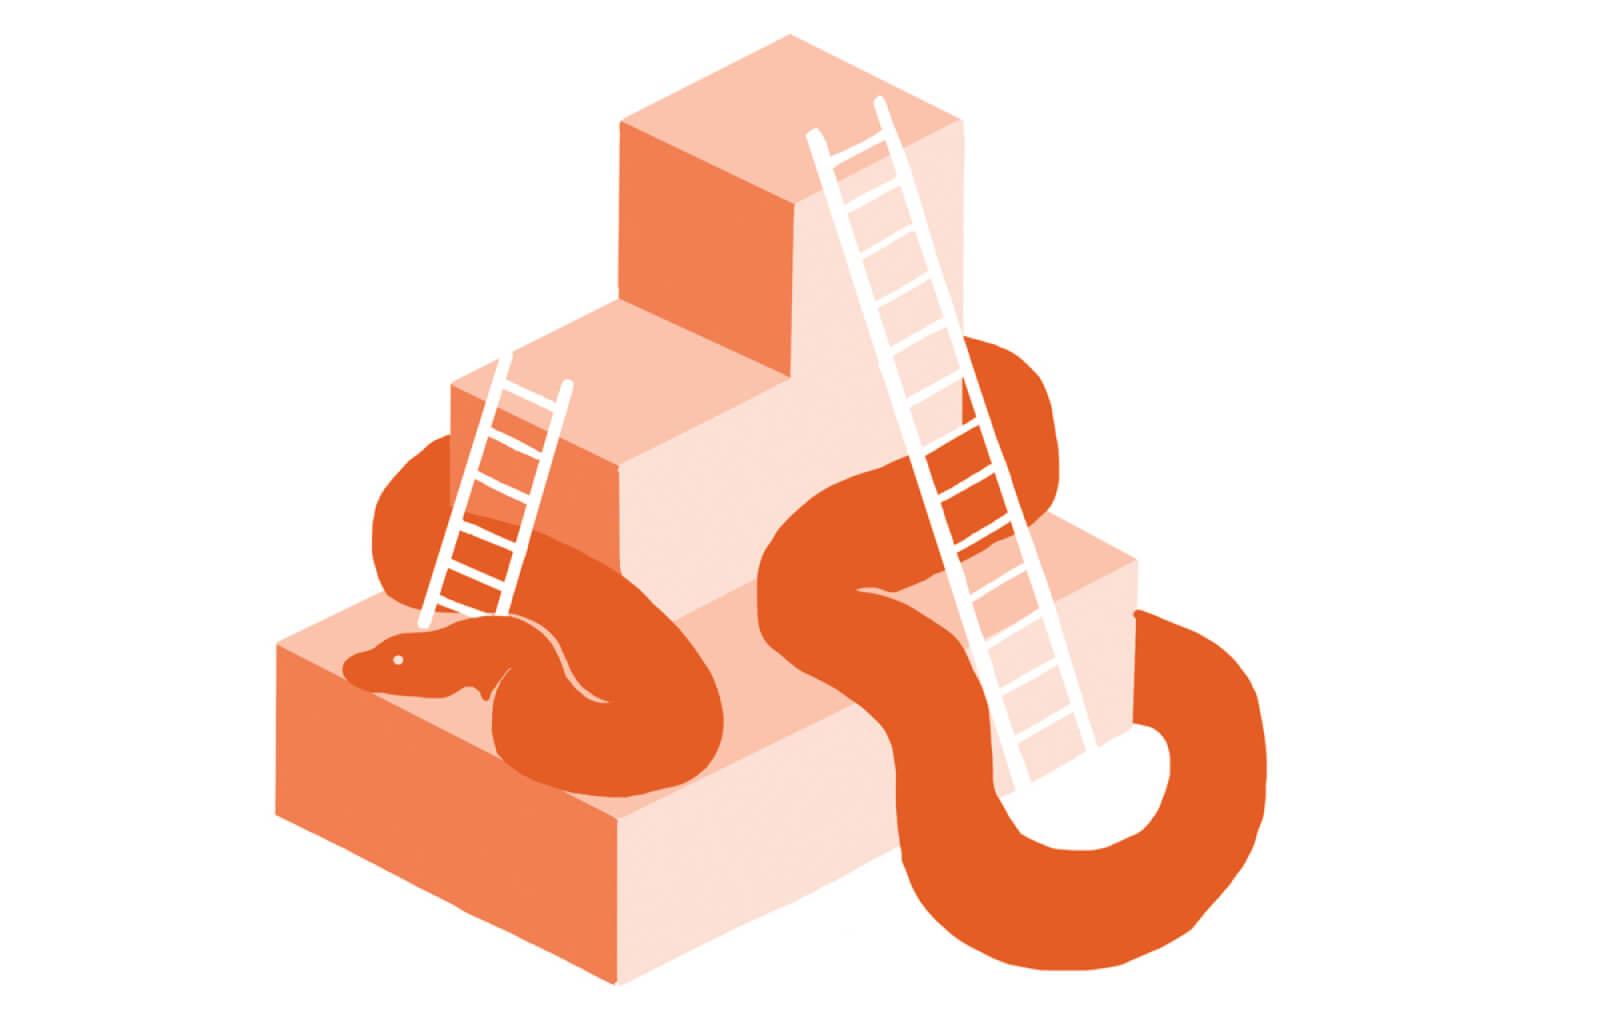 elitist britain illustration snakes